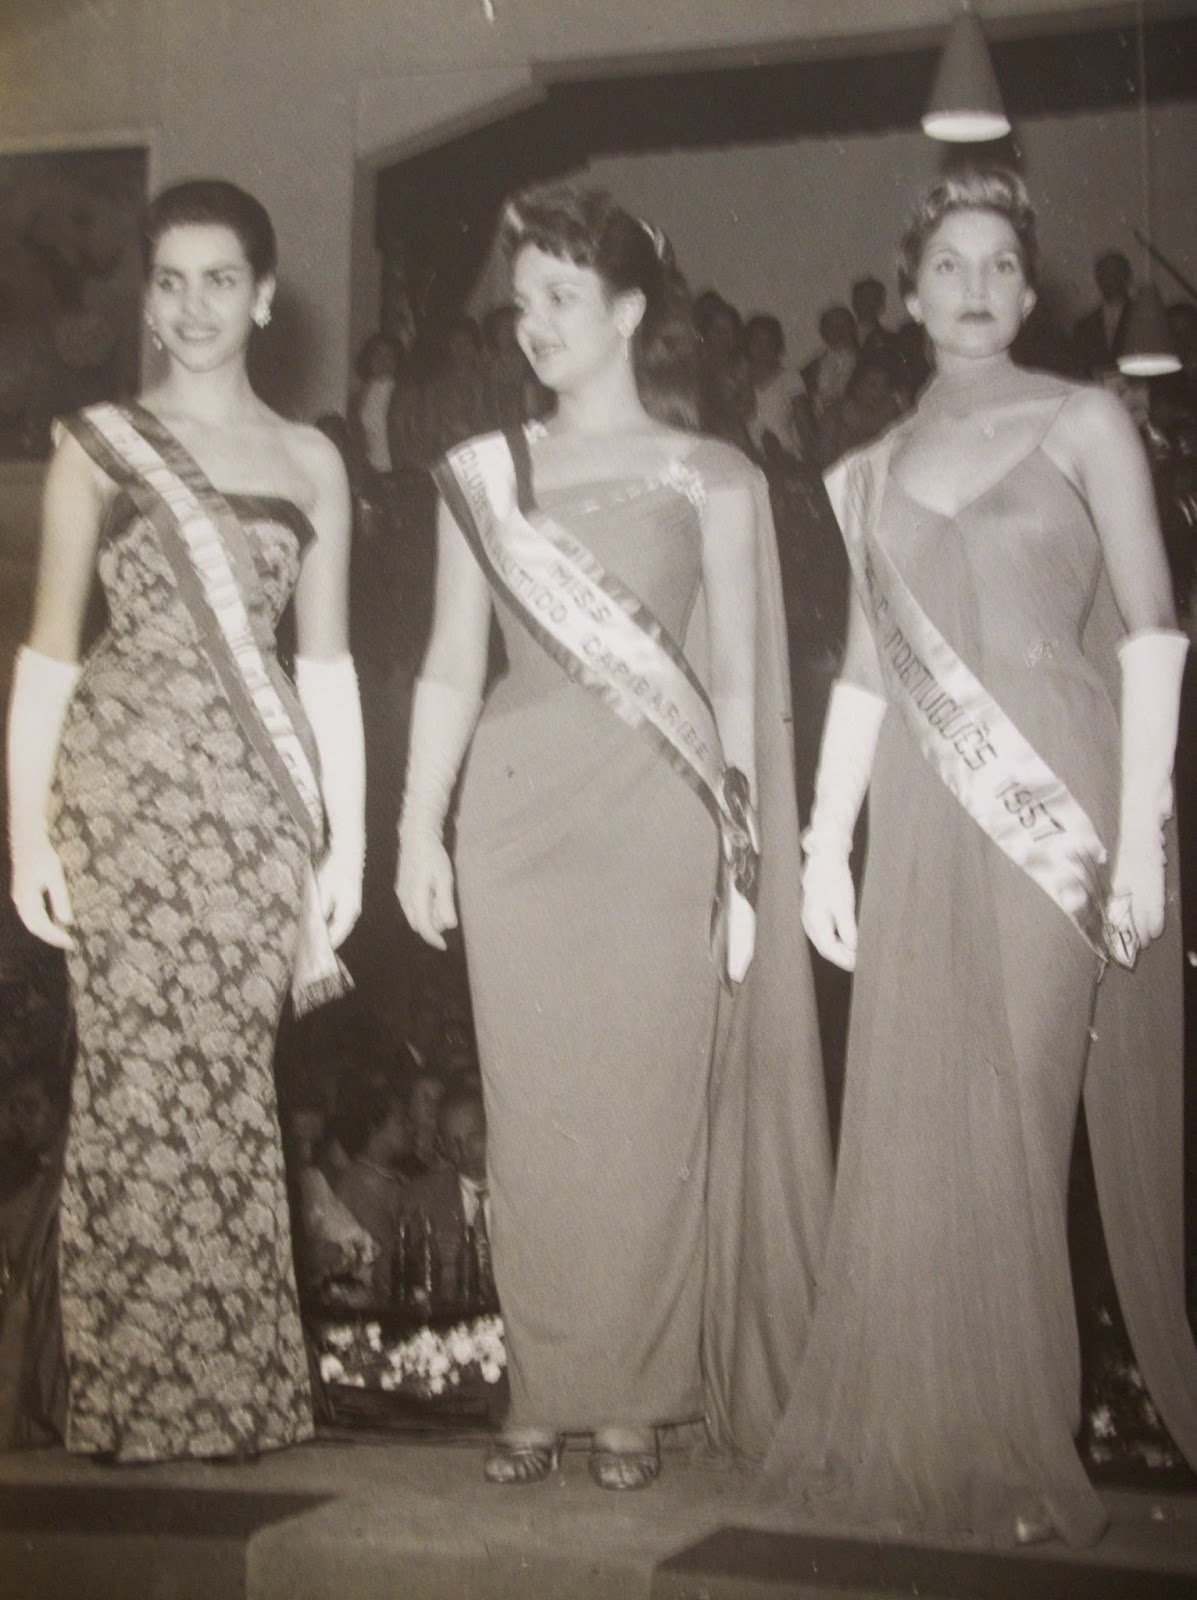 sonia maria campos, 6th runner-up de miss world 1958. primeira brasileira a participar de miss world. 100_9110